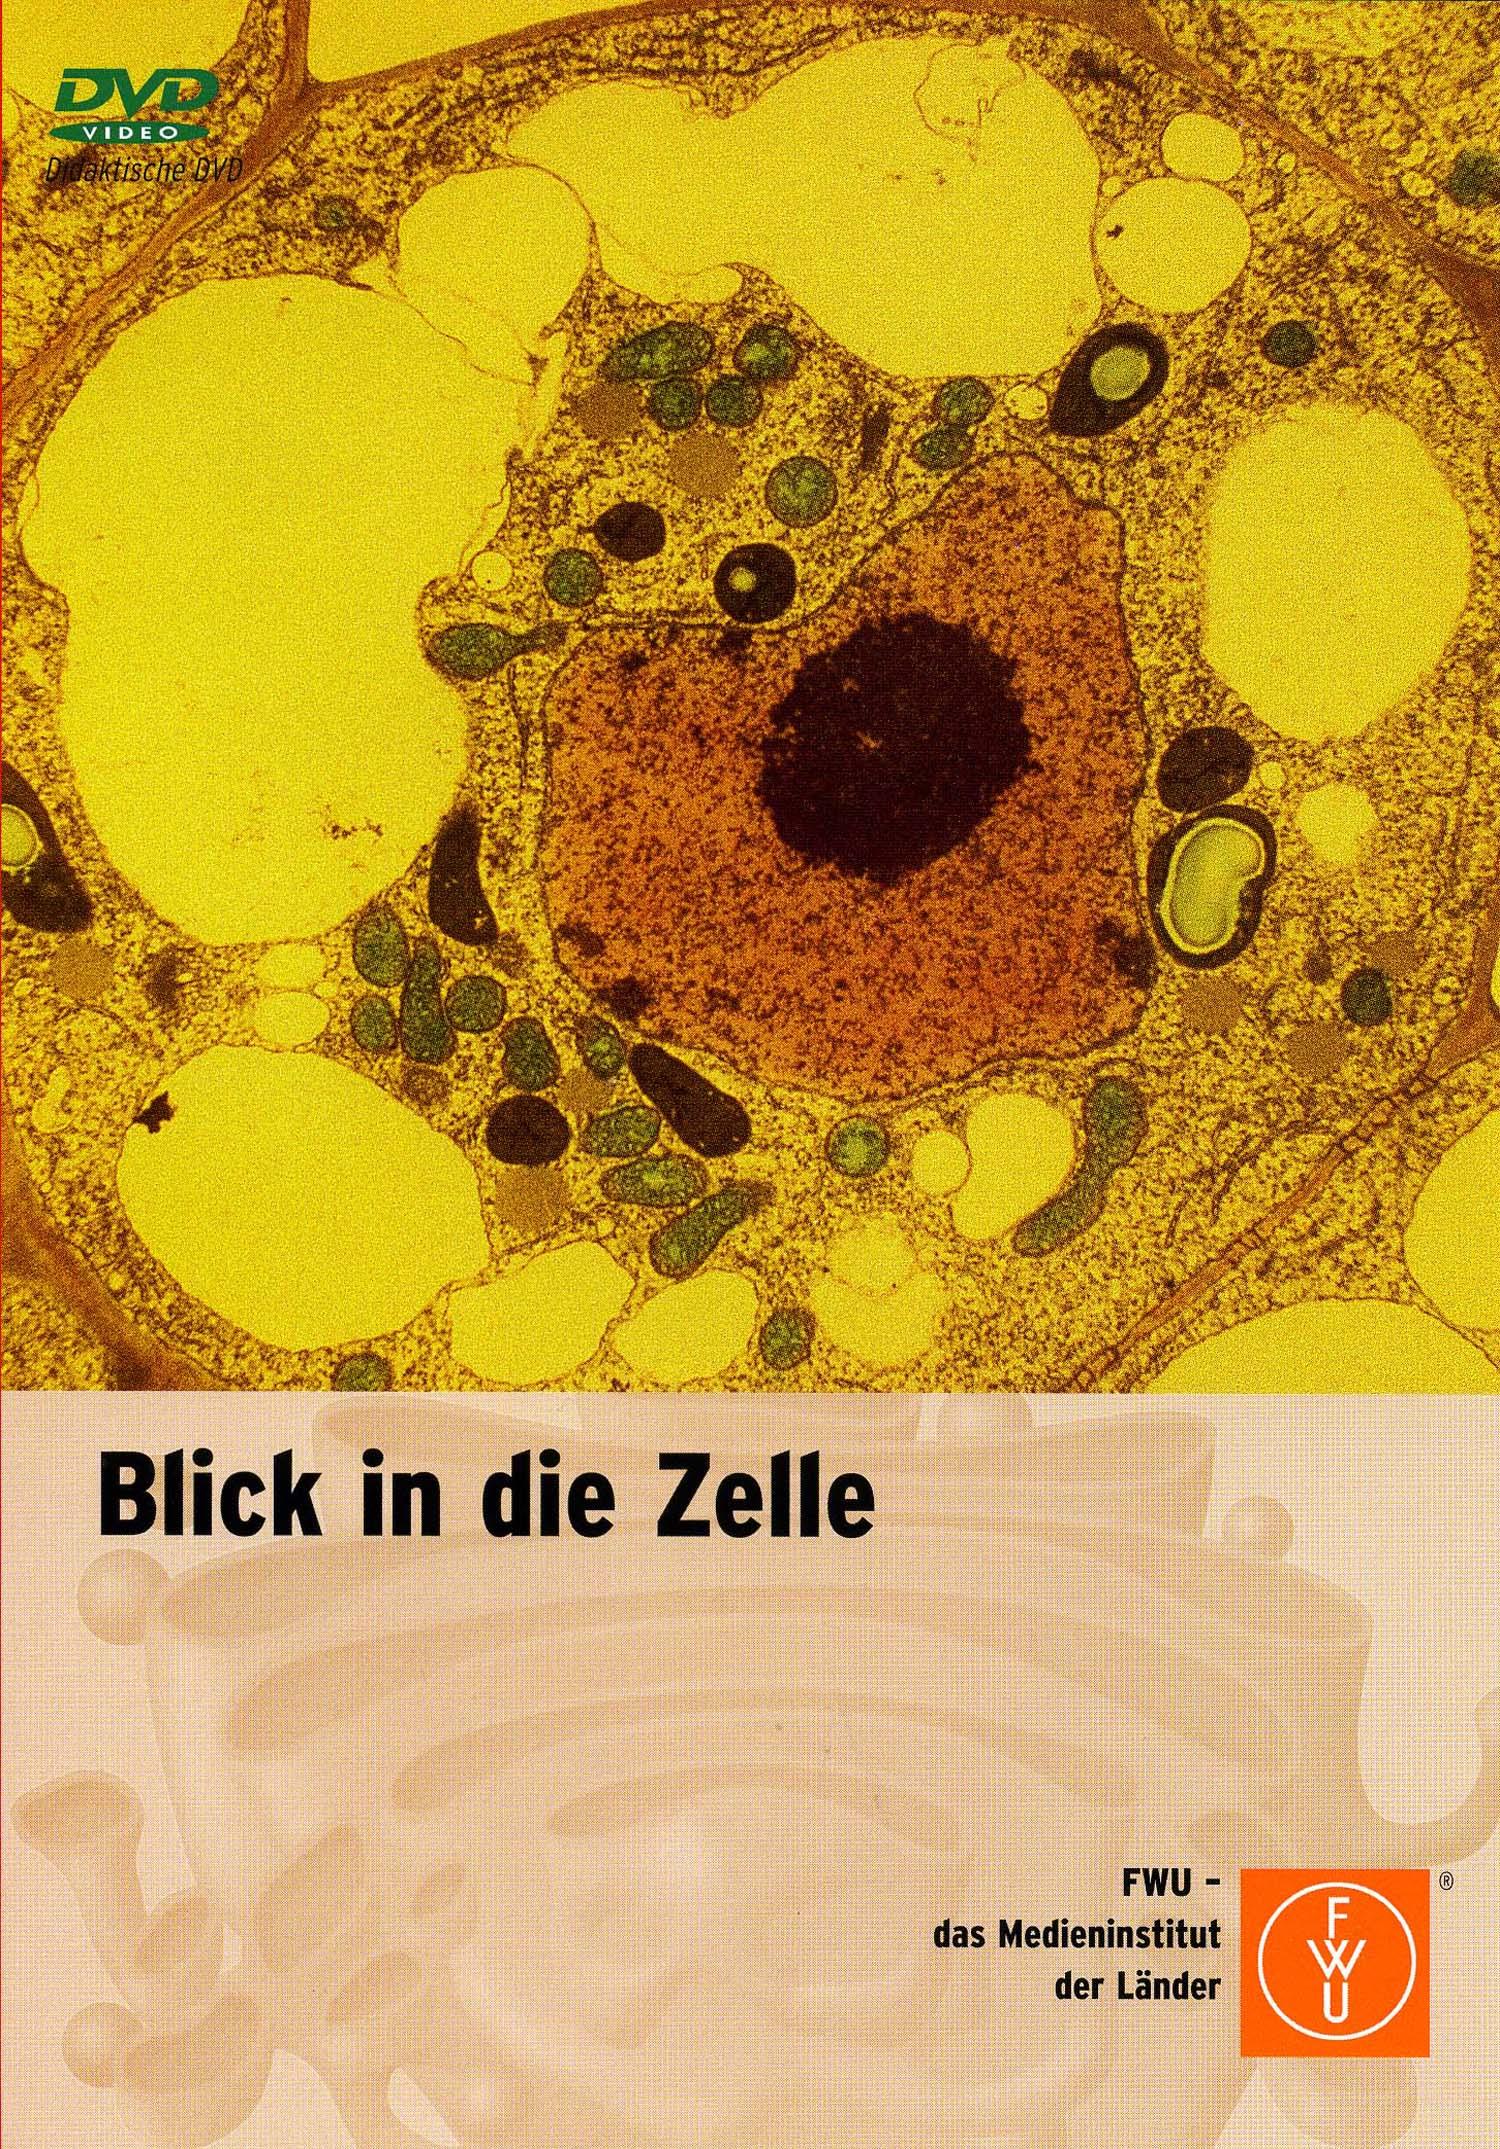 Blick in die Zelle